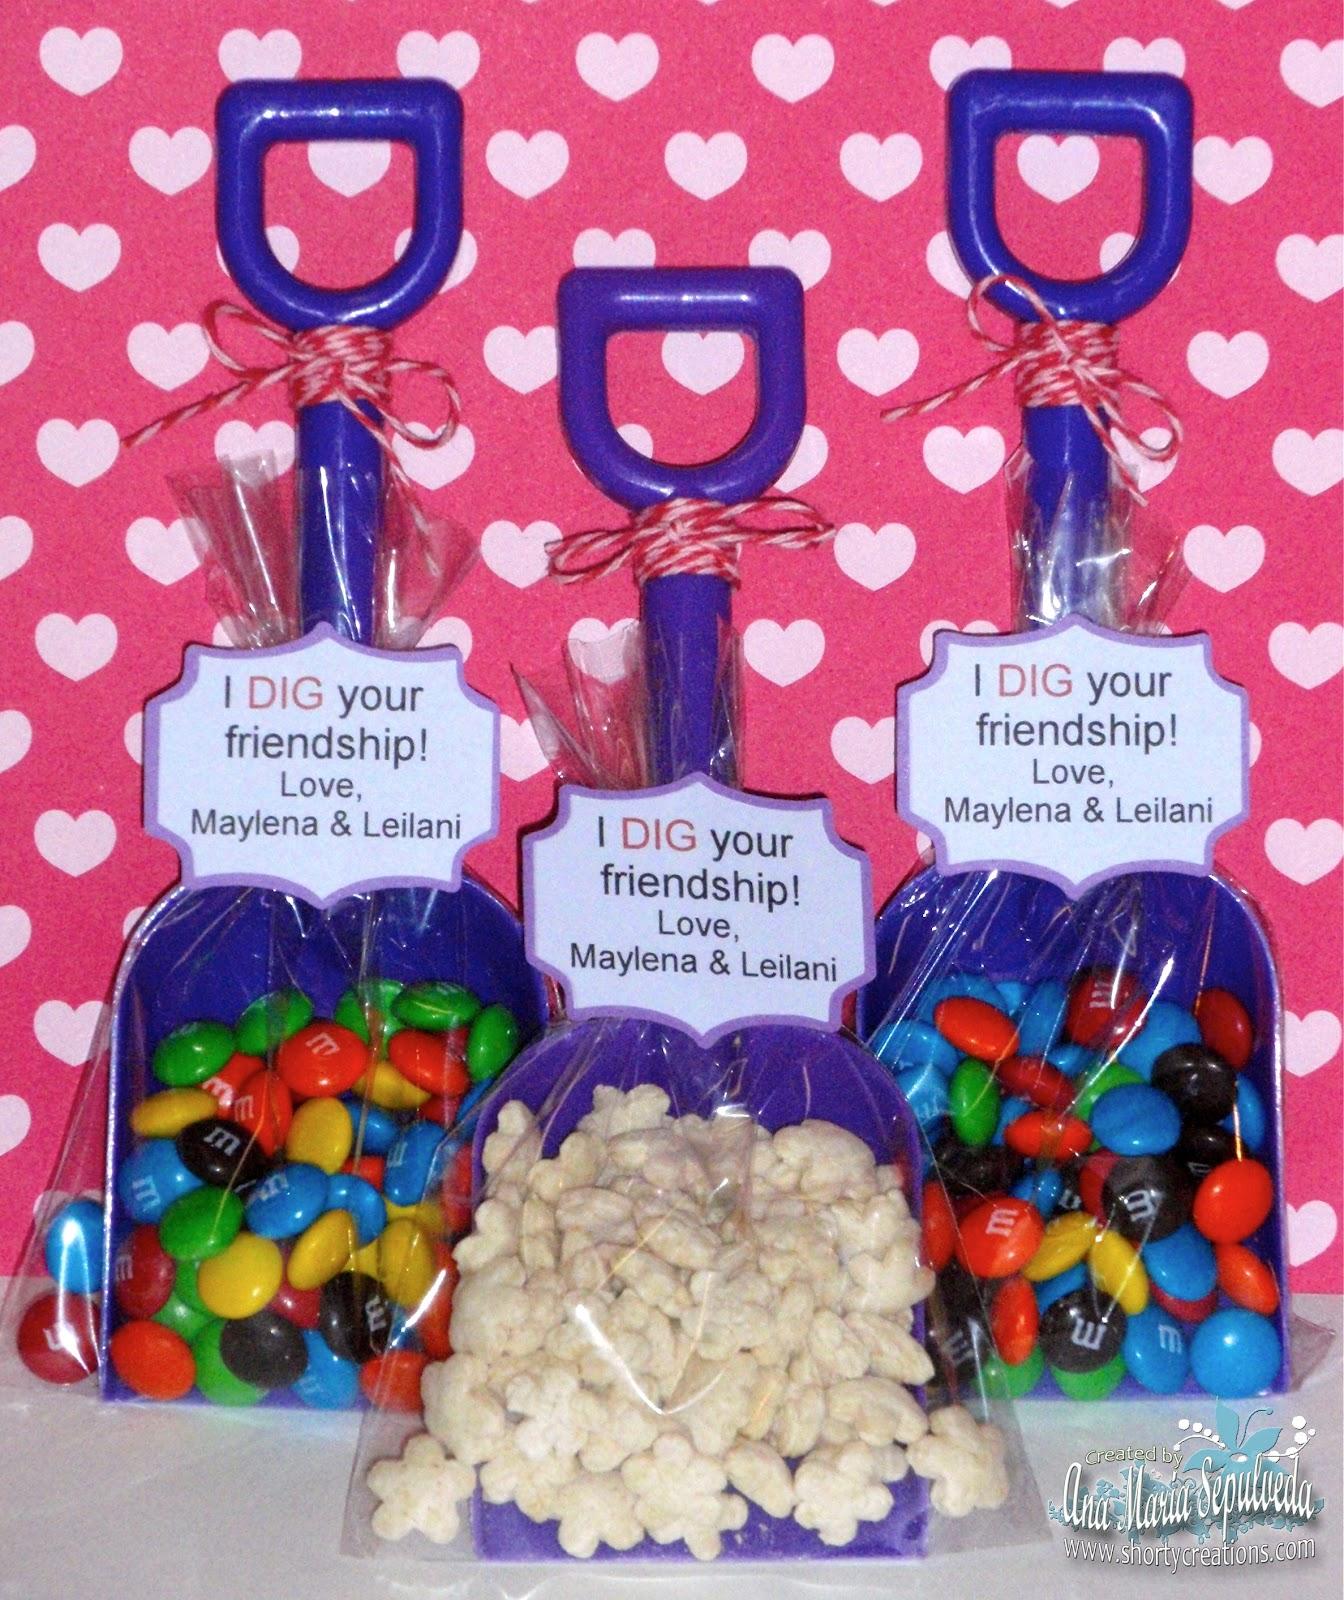 Bolsas de cumplea os caseras para ni os fiestas infantiles for Friendship crafts for 2 year olds